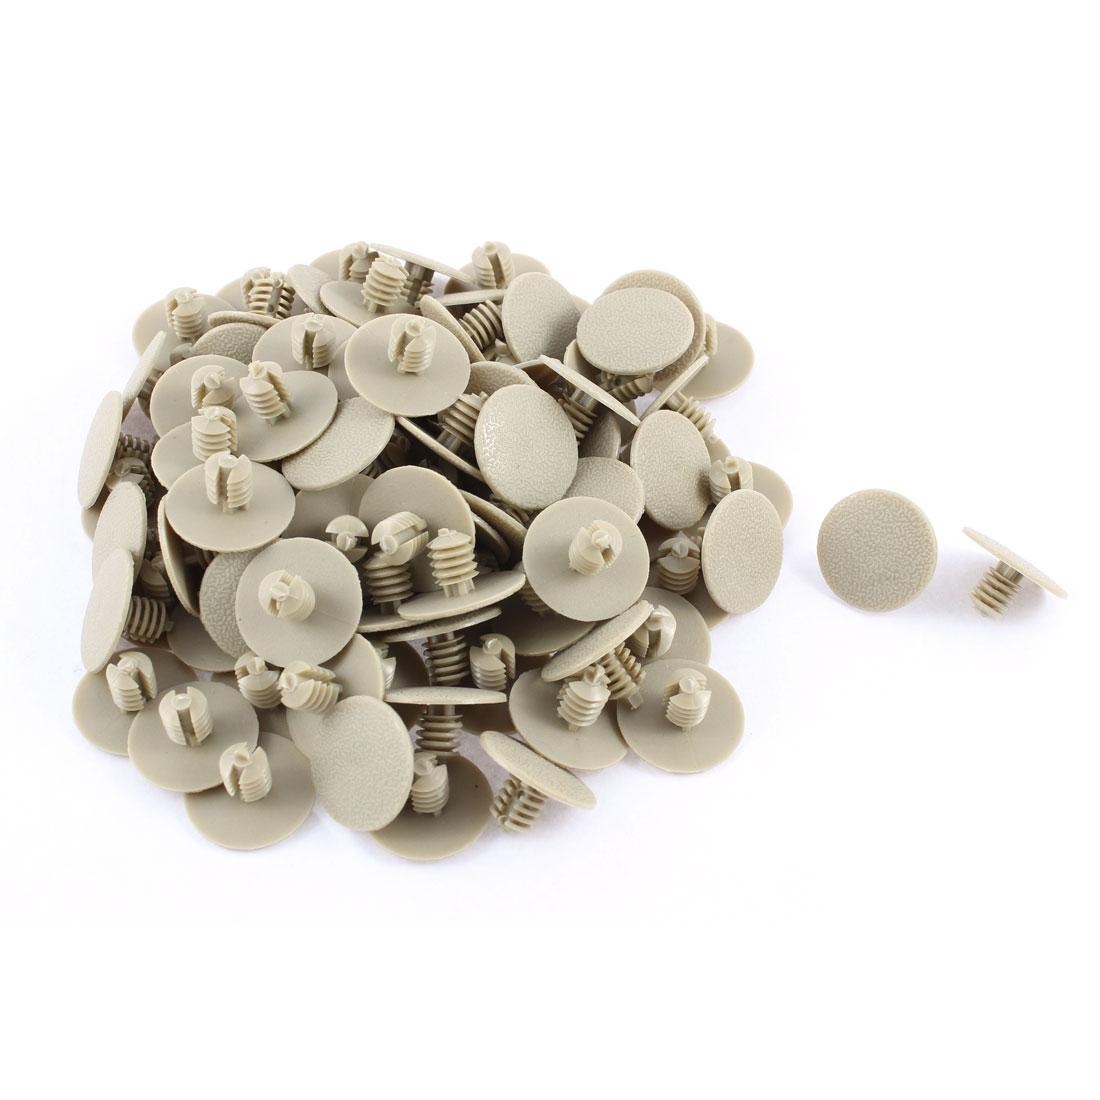 100 Pcs Gray Plastic Rivet Trim Fastener Retainer Clips 7mm x 9mm x 20mm